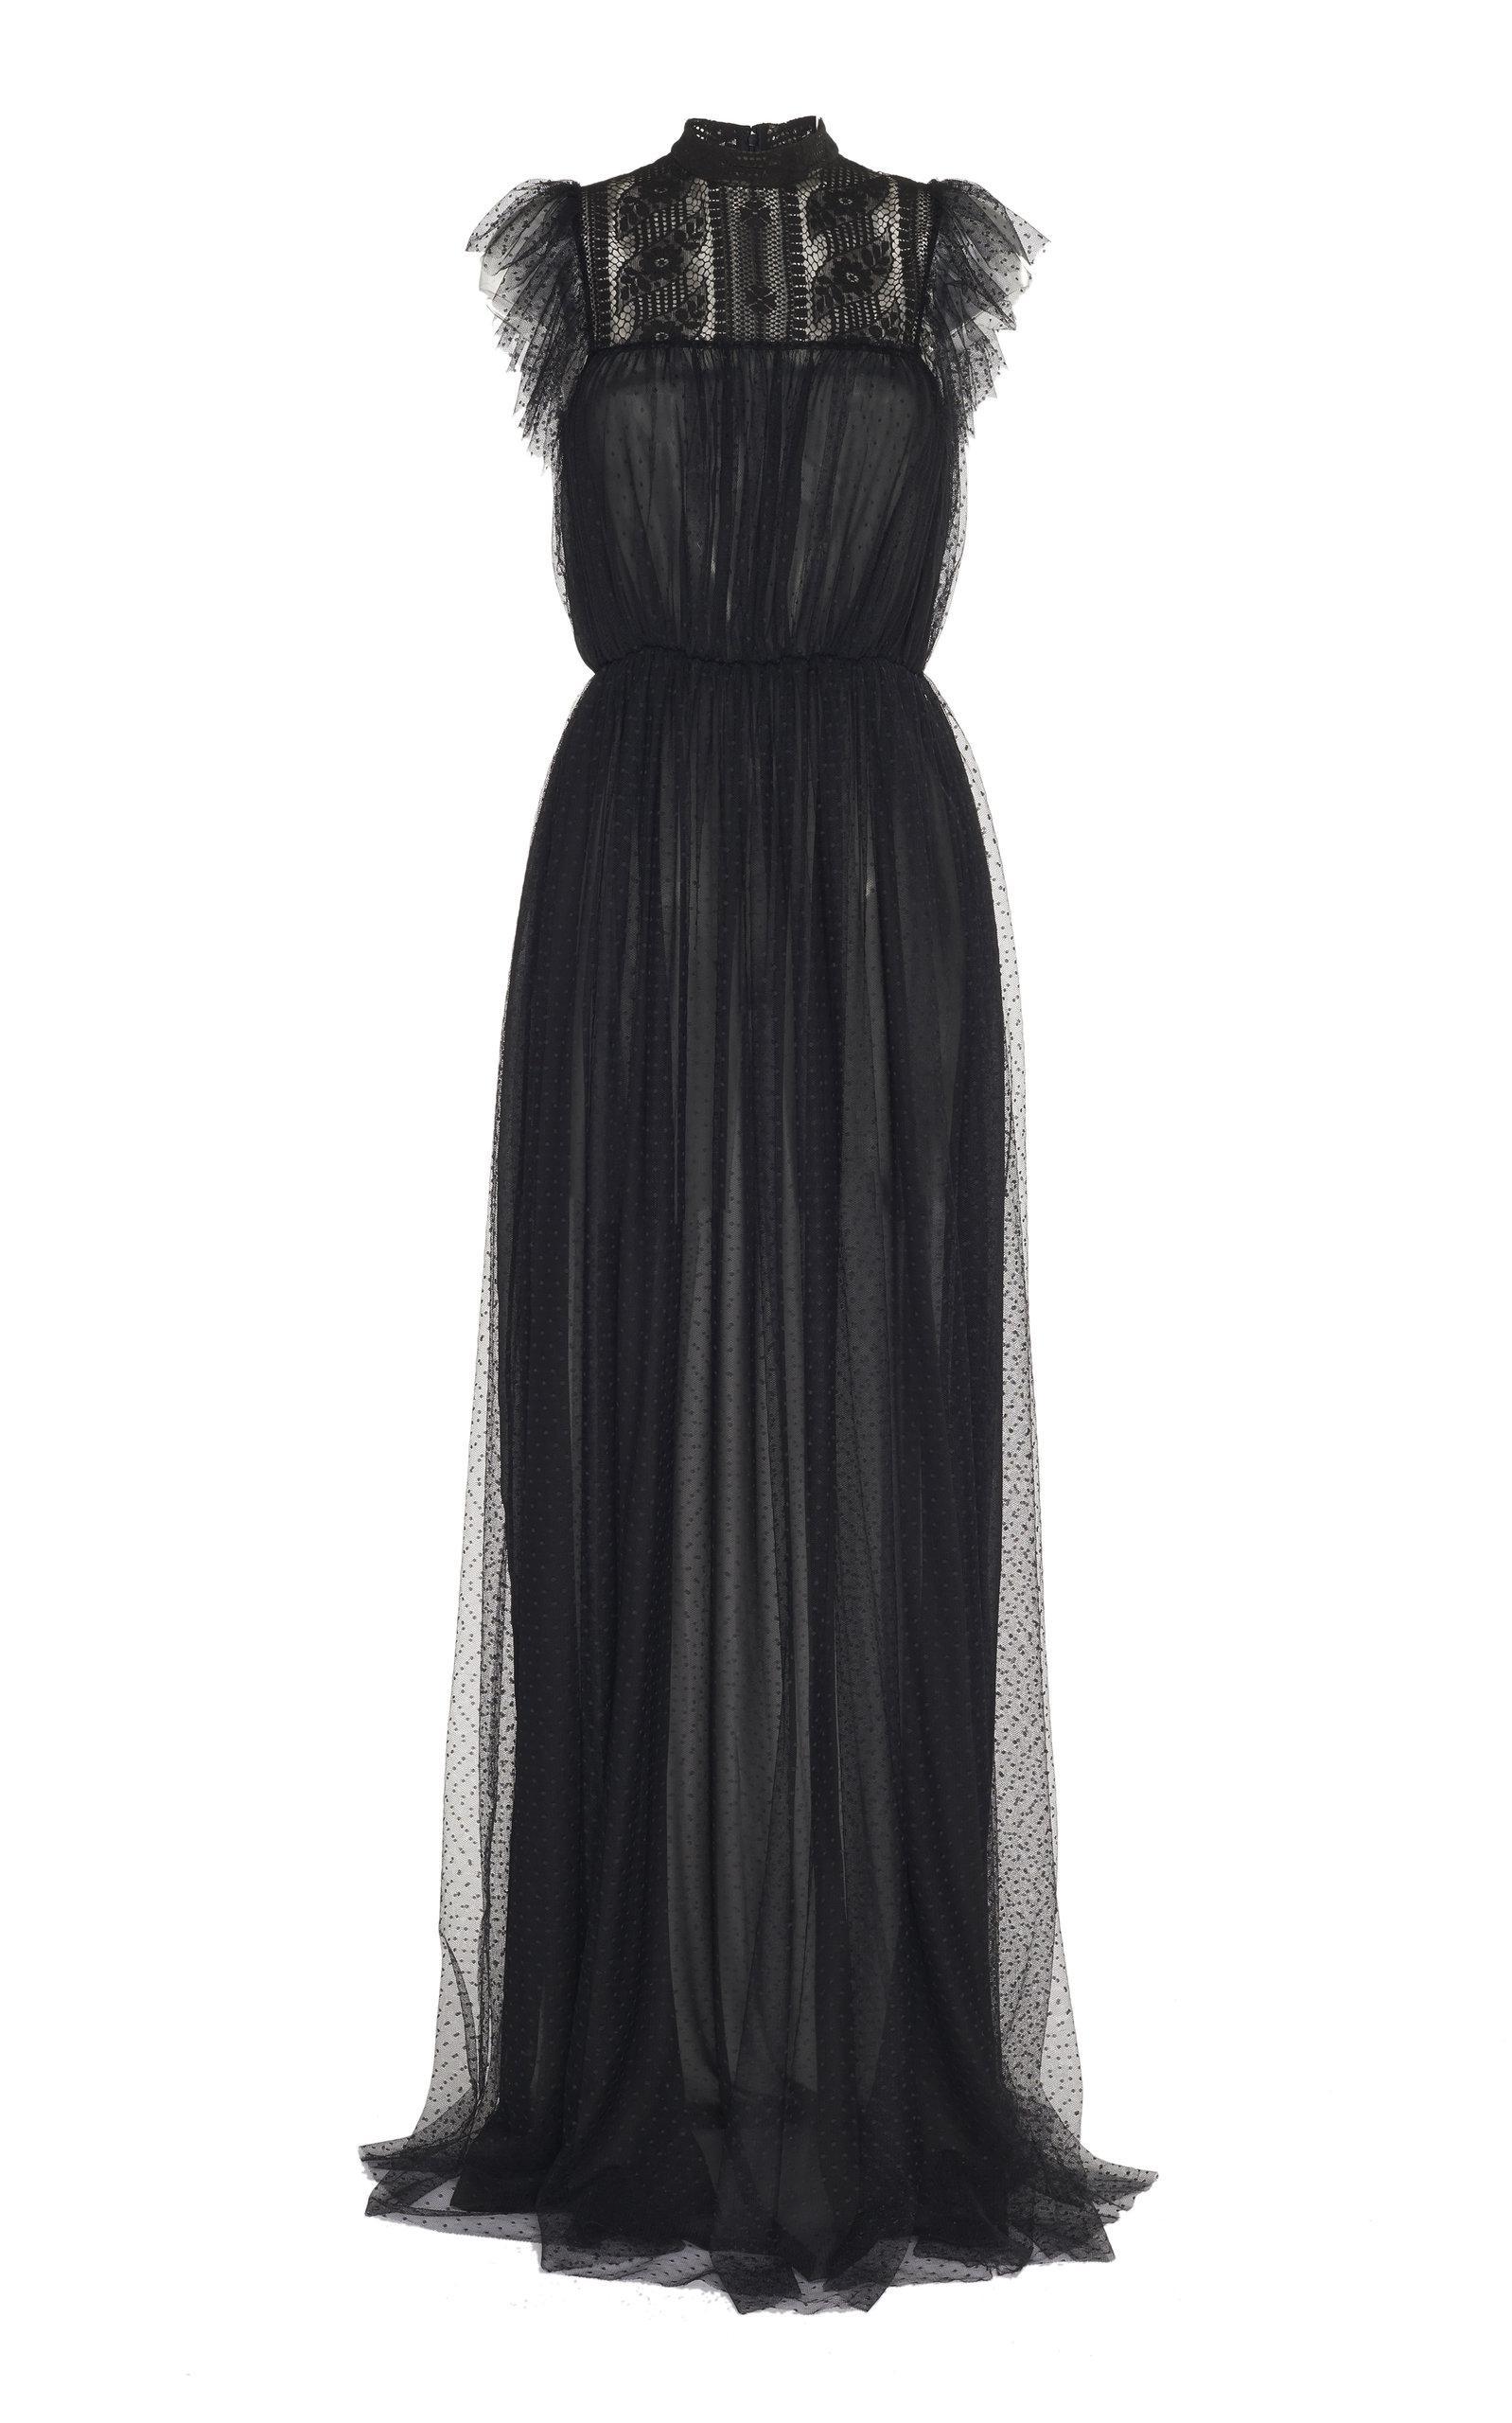 42c1749c02 Lyst - Giambattista Valli Ruffle Maxi Dress in Black